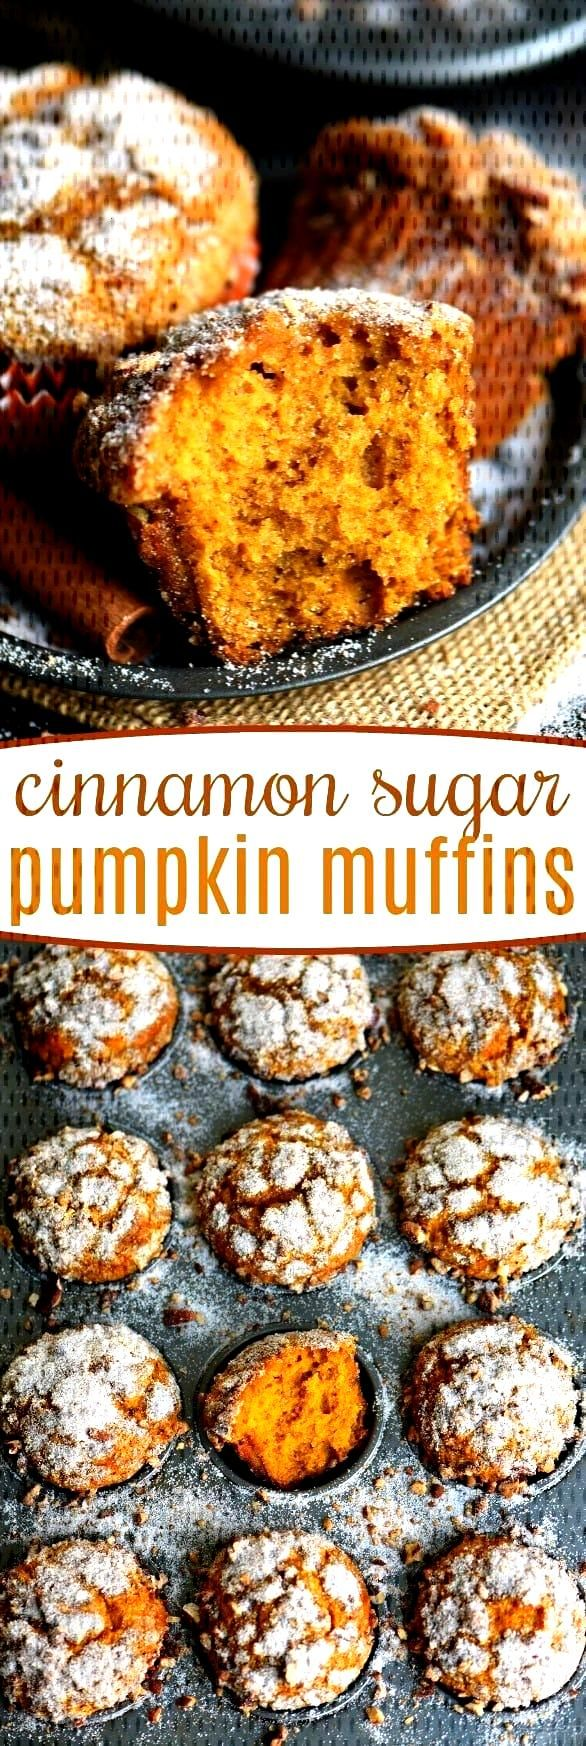 Cinnamon Sugar Pumpkin Muffins Say hello to fall with these delicious Cinnamon Sugar Pumpkin Muffin